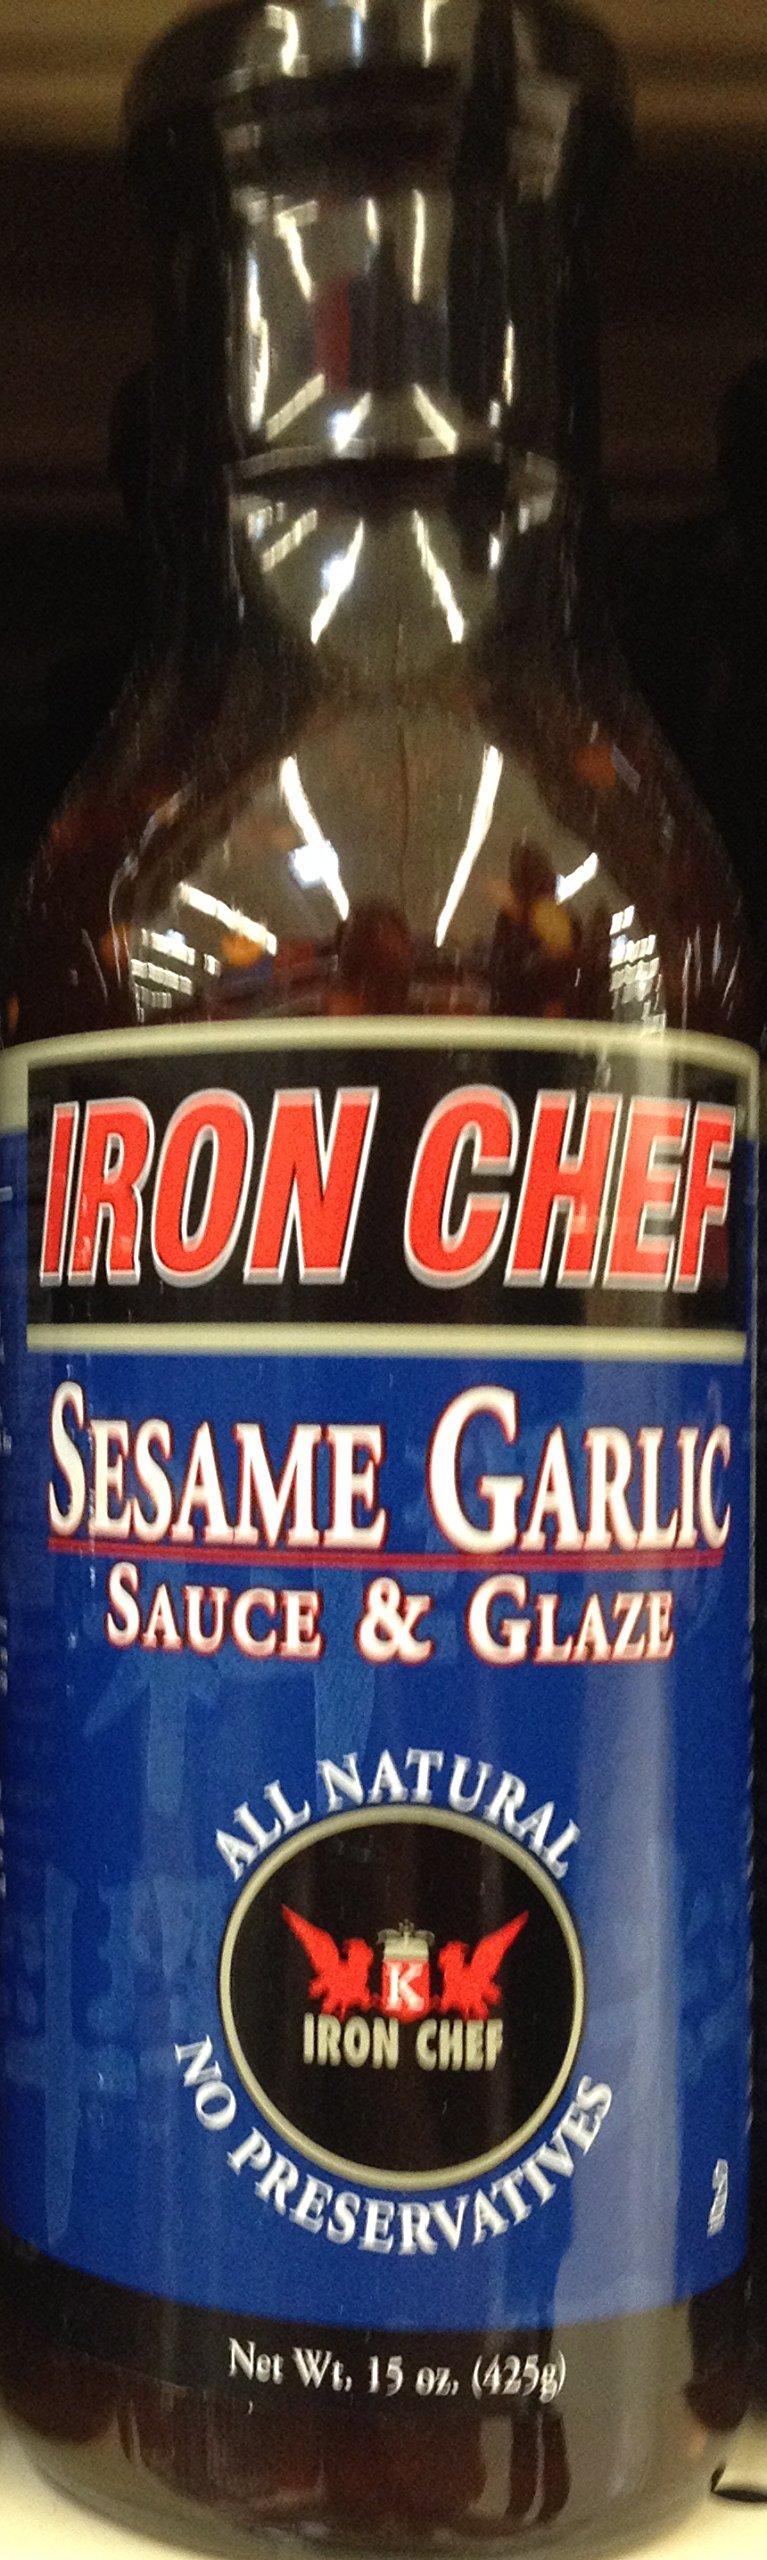 Iron Chef SESAME GARLIC SAUCE & GLAZE 15oz. (Pack of 5)